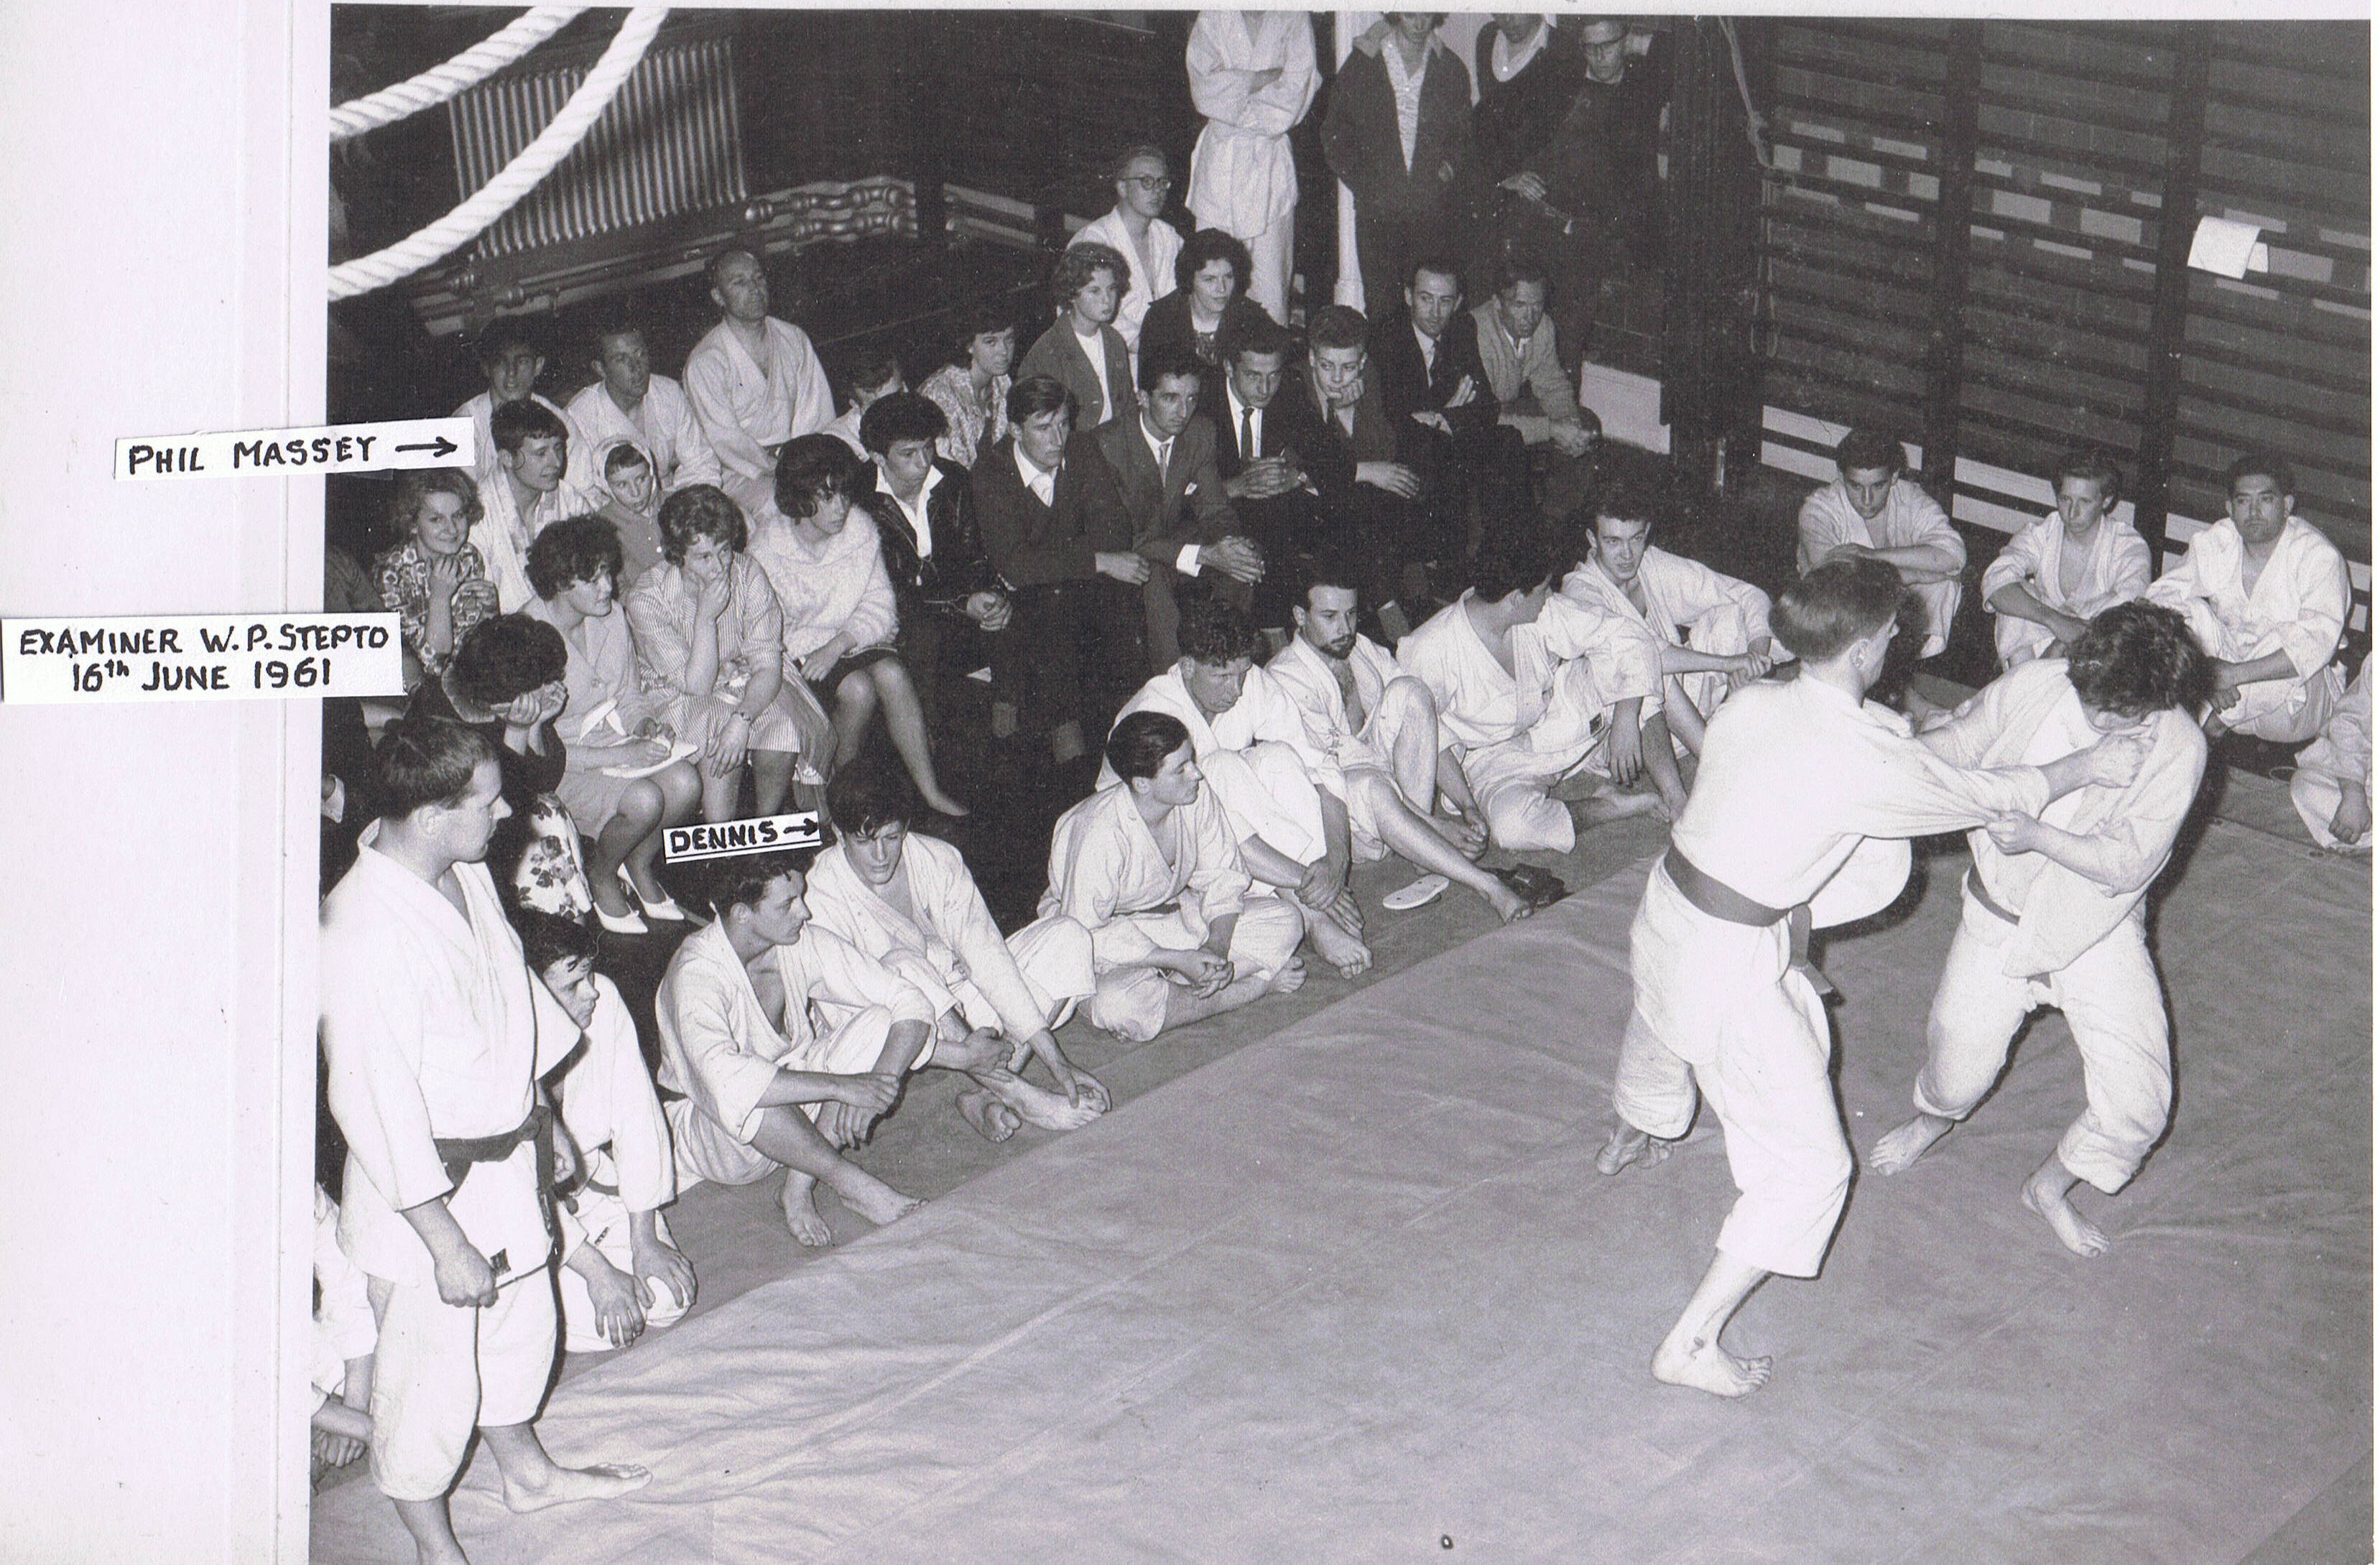 16th June 1961 Grading